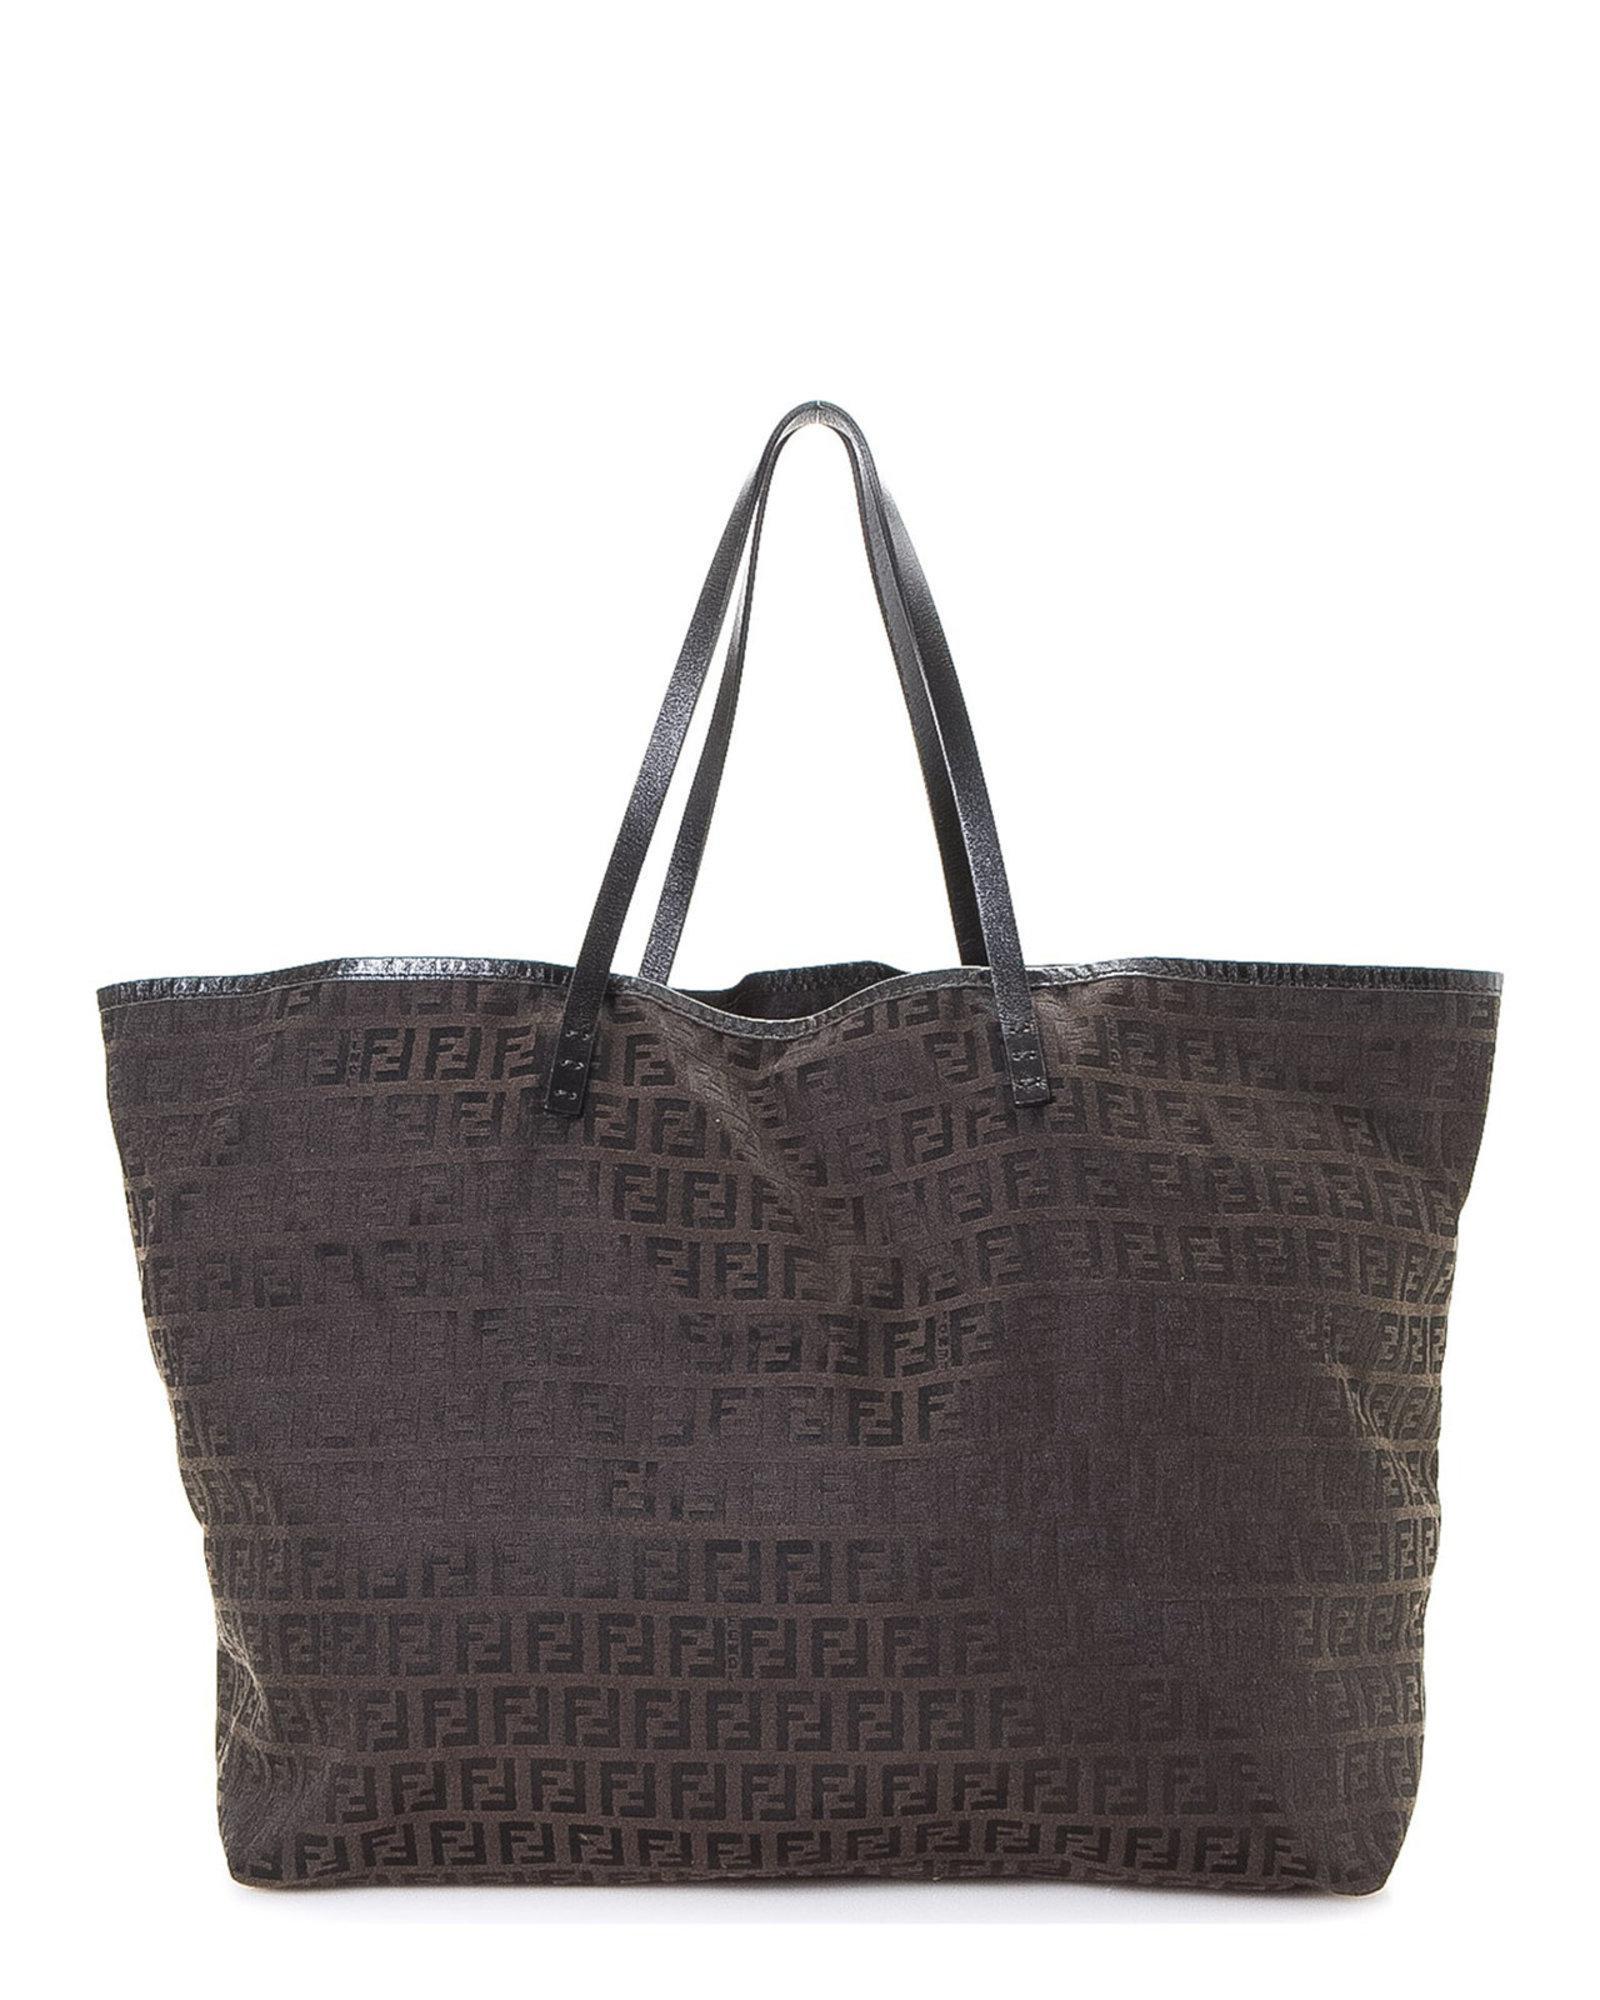 40c2b61fe787 Lyst - Fendi Zucchino Tote Bag - Vintage in Brown